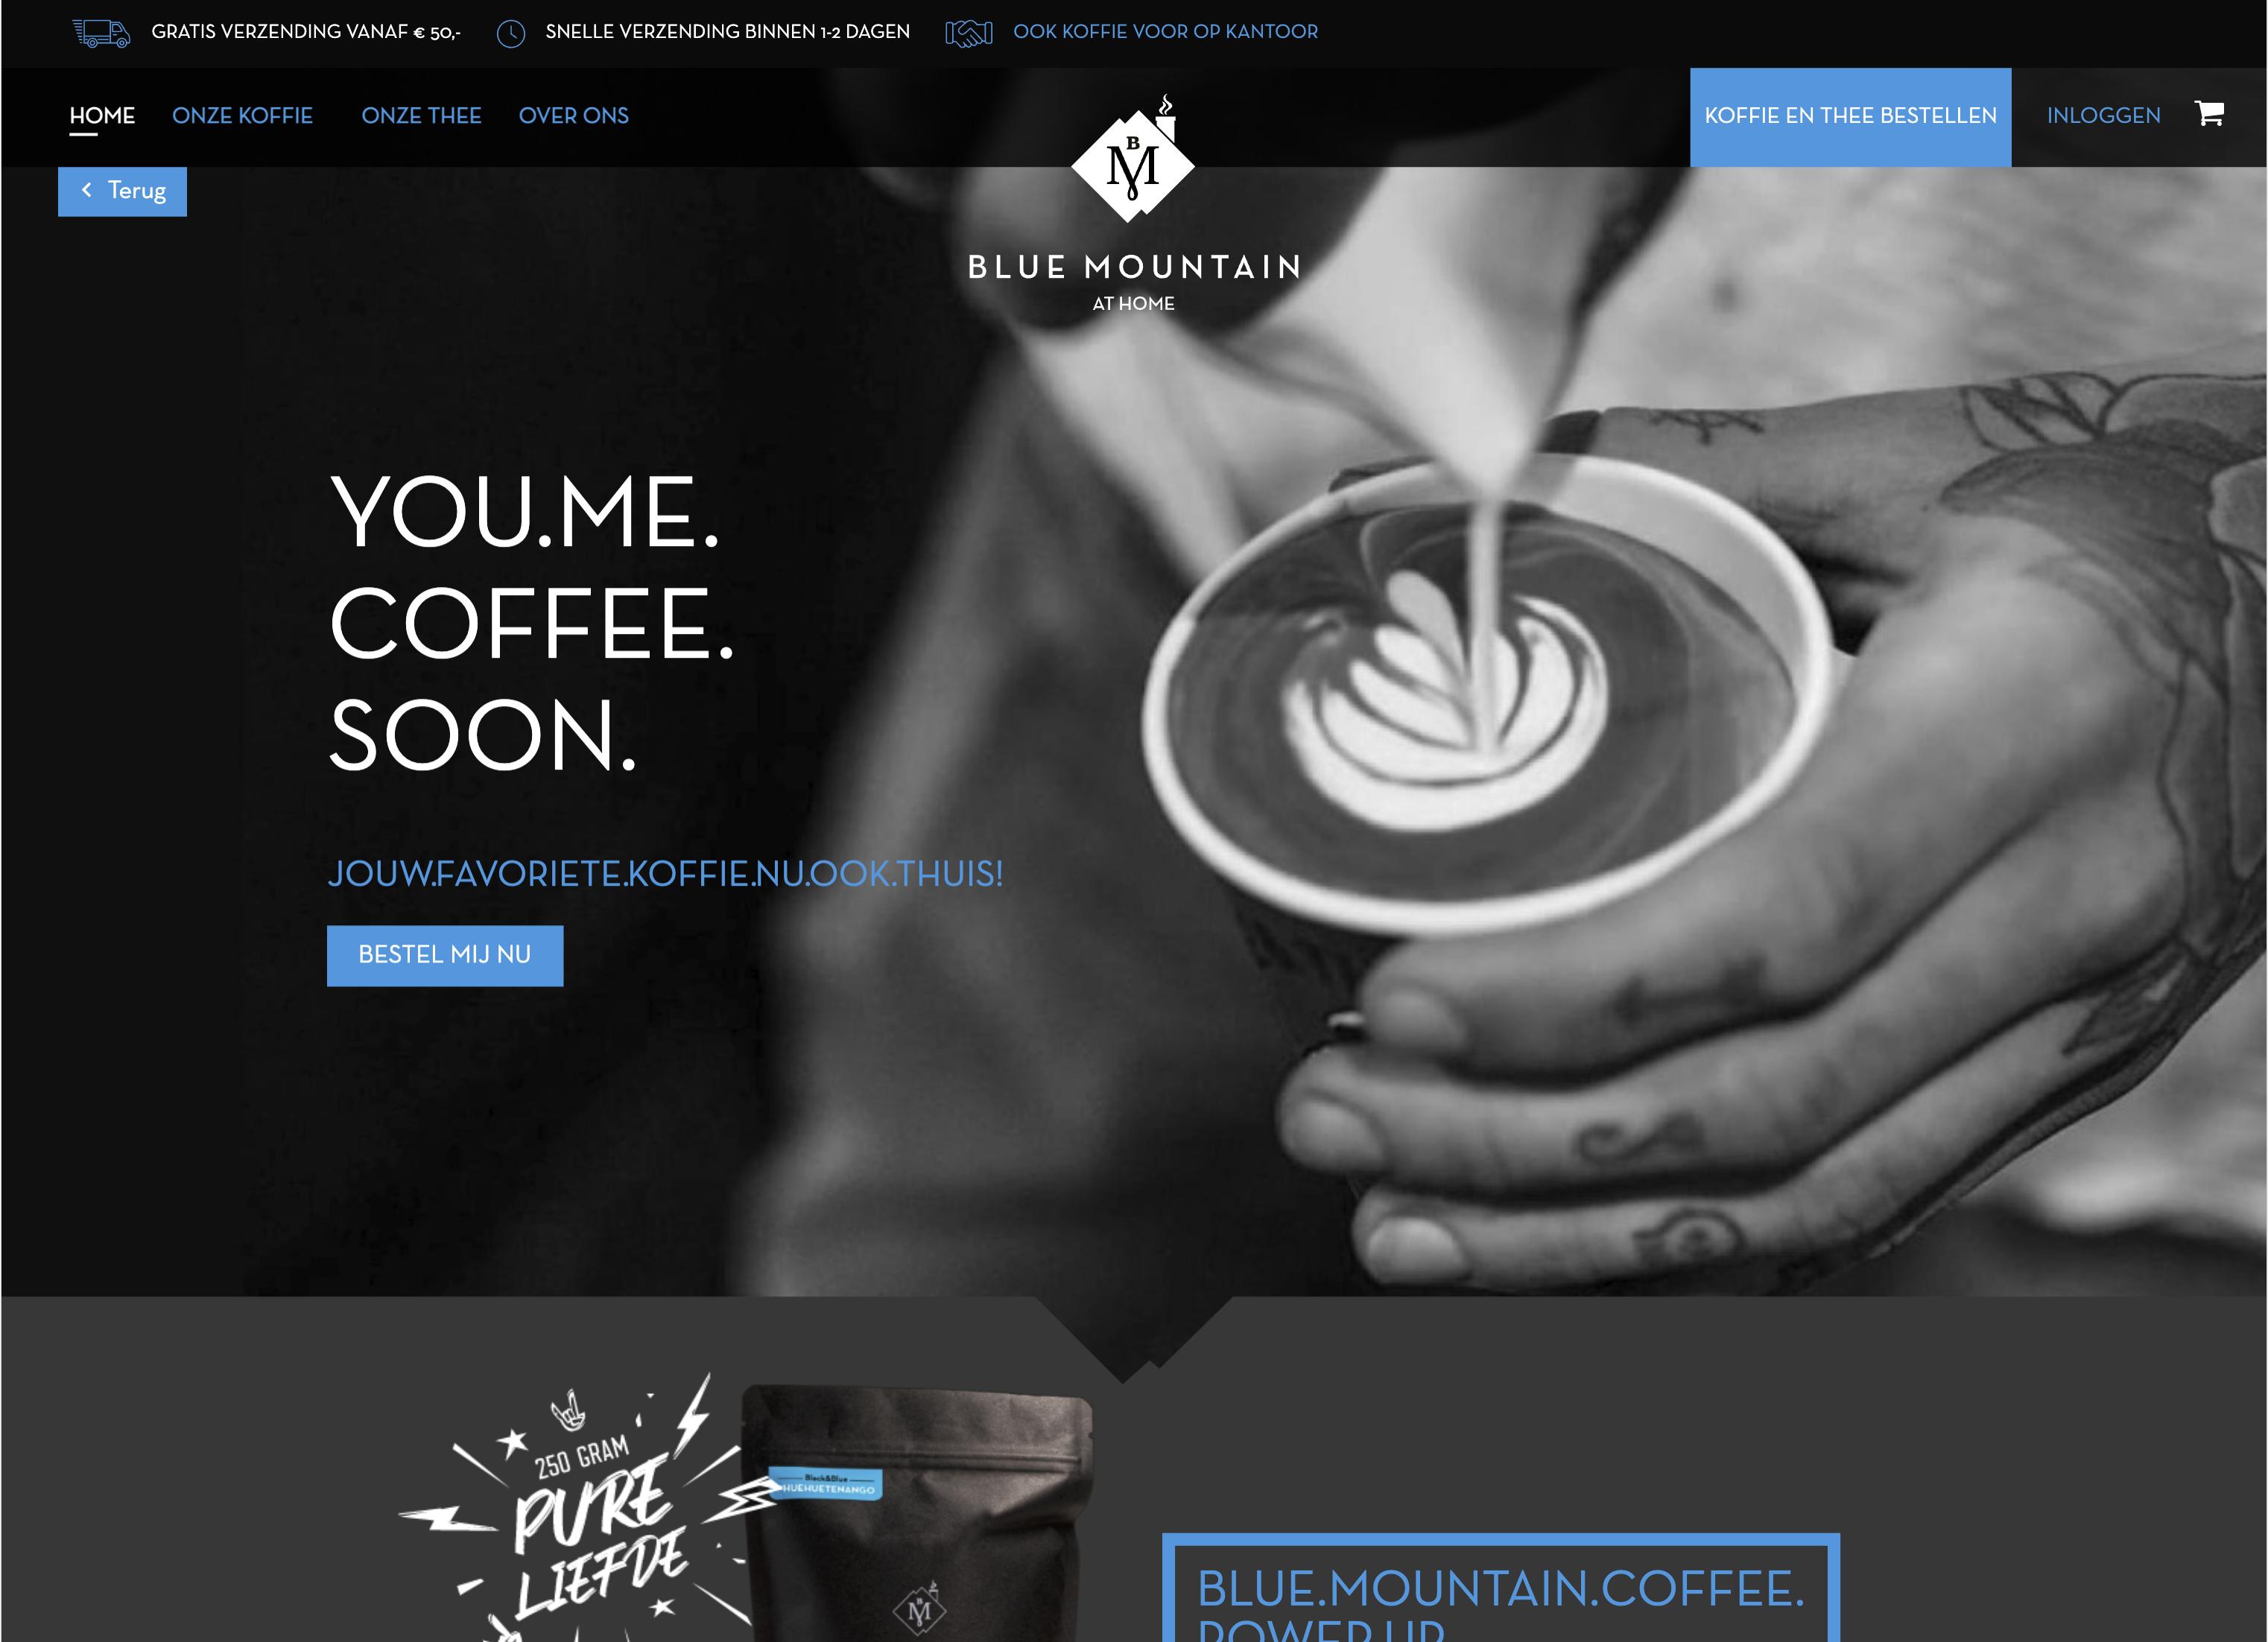 Blue MountainMagento webshop case